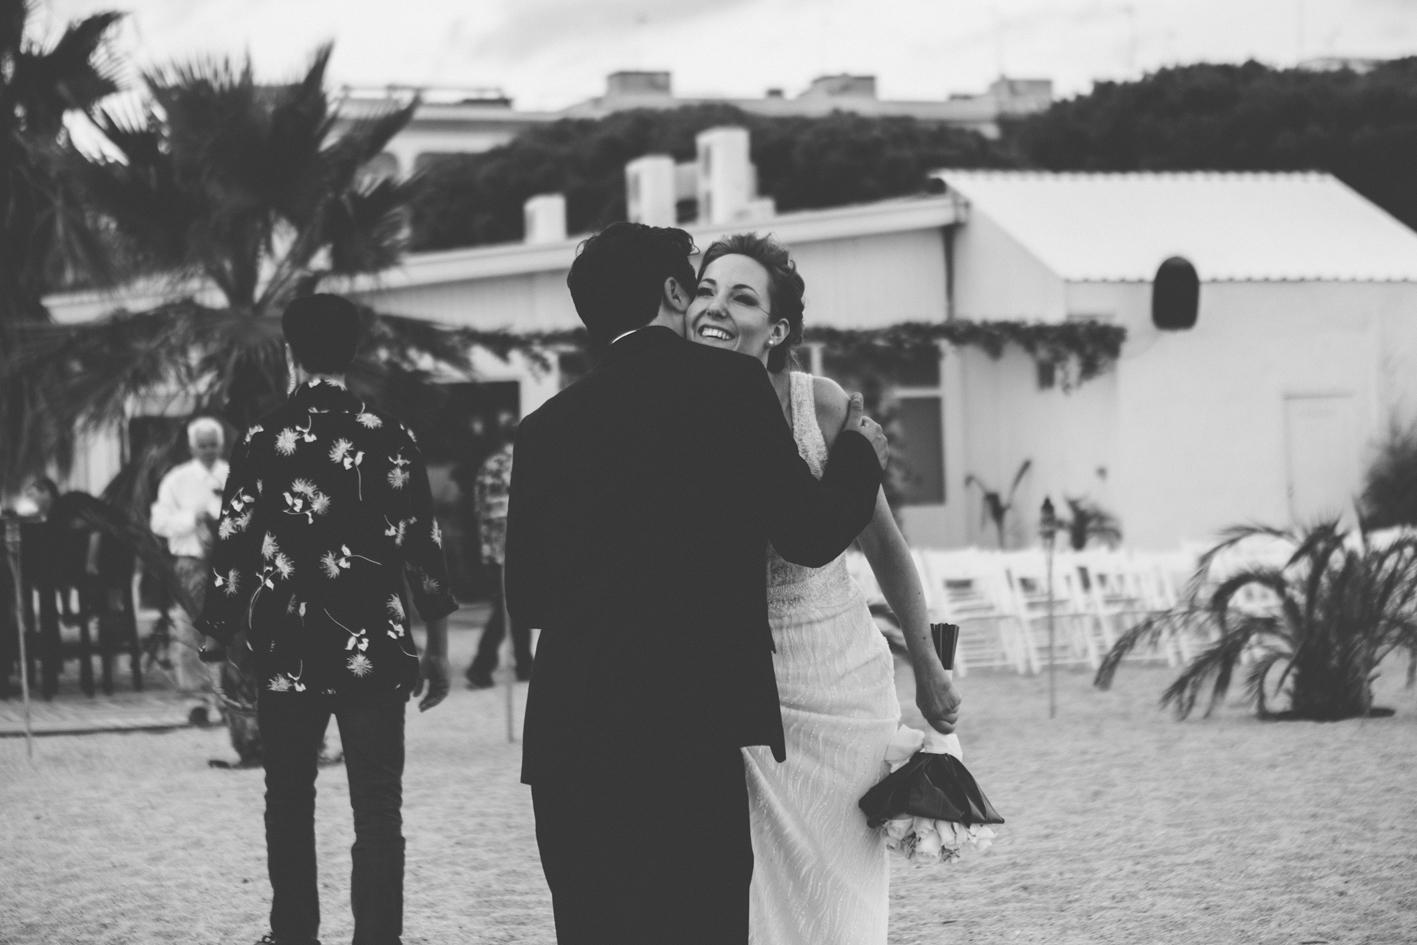 Pierre Atelier / wedding photographer Paris / photographe mariage/ wedding planner